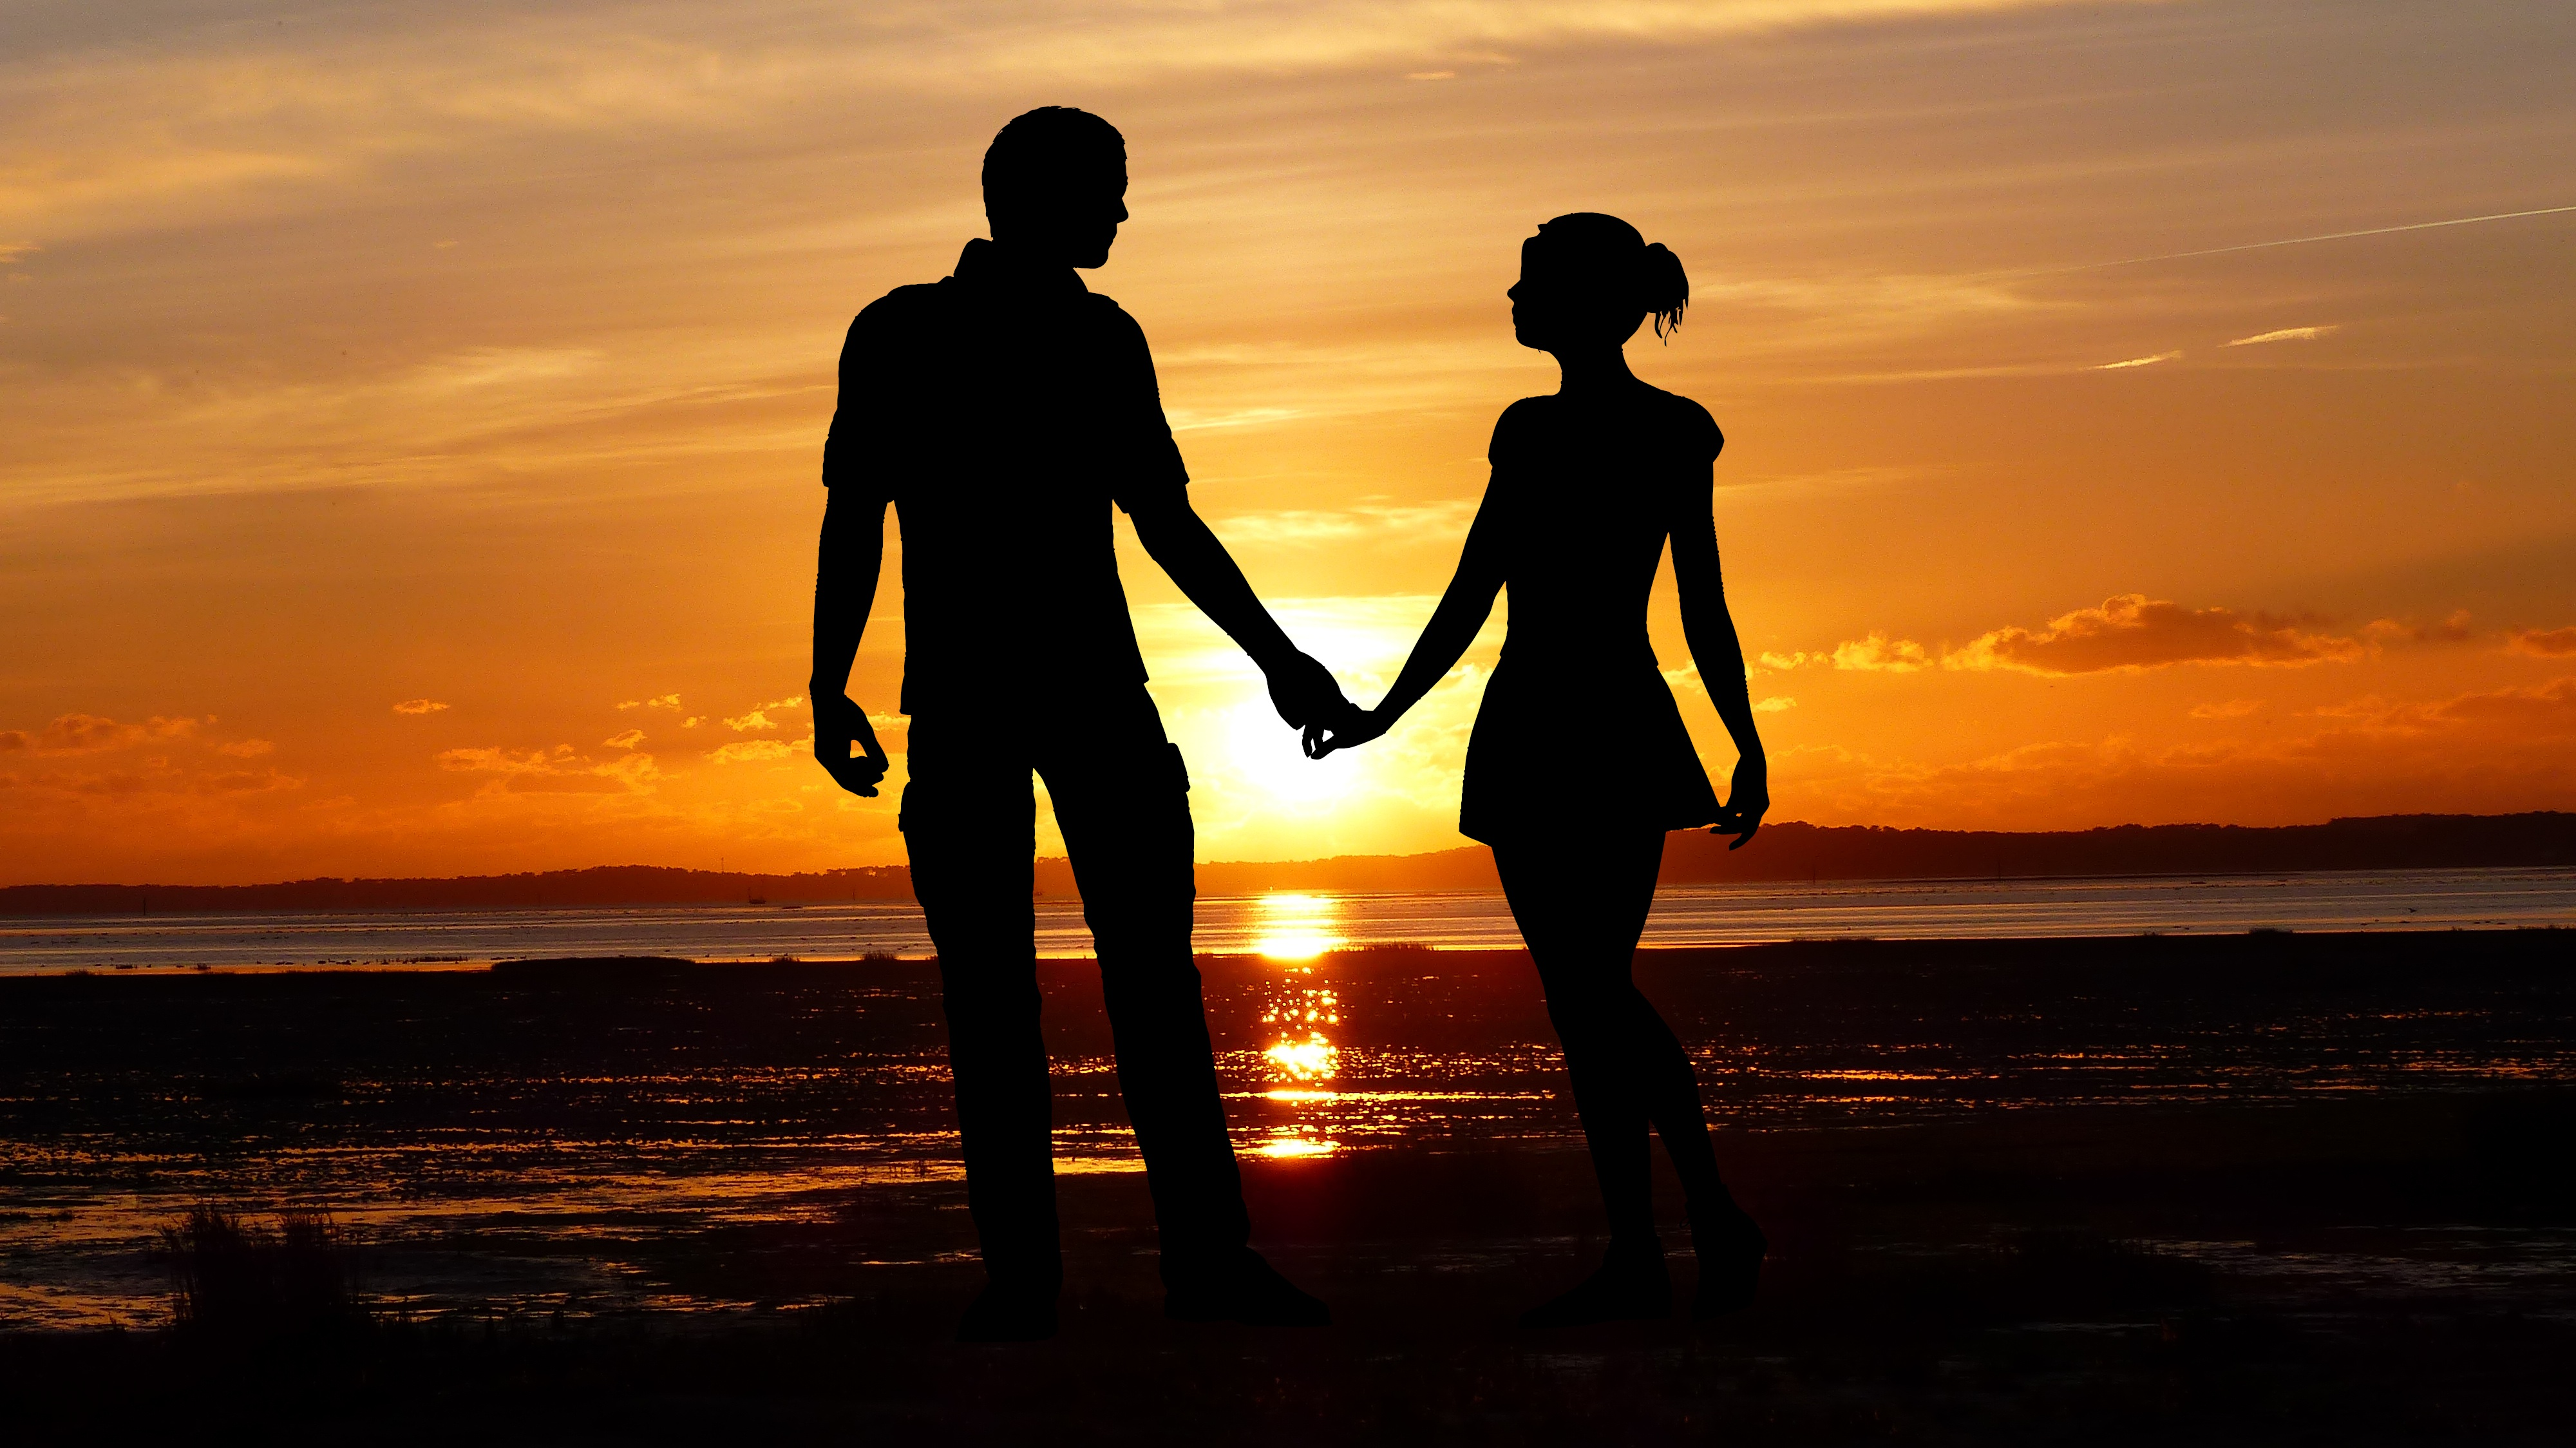 couple-beach-romantic-silhouette-sunset-seascape-together-4000x2248-1696.jpg